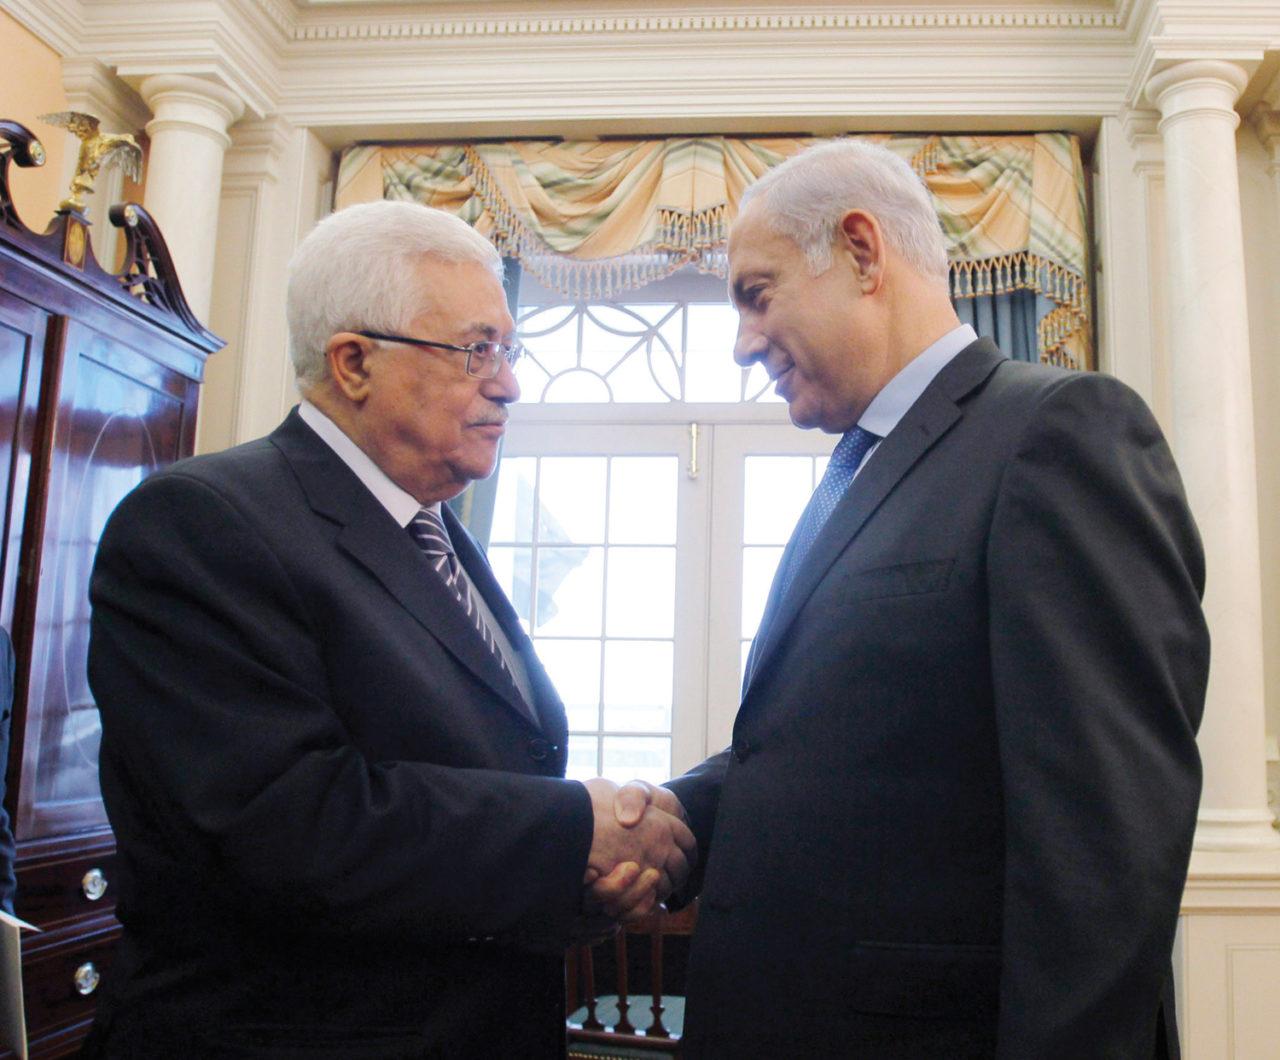 Palestinian Authority President Mahmoud Abbas (left) and Israeli Prime Minister Benjamin Netanyahu before direct peace talks in Washington, D.C., in Sept. 2010 (Photo/JTA-Getty-Jason Reed-Pool